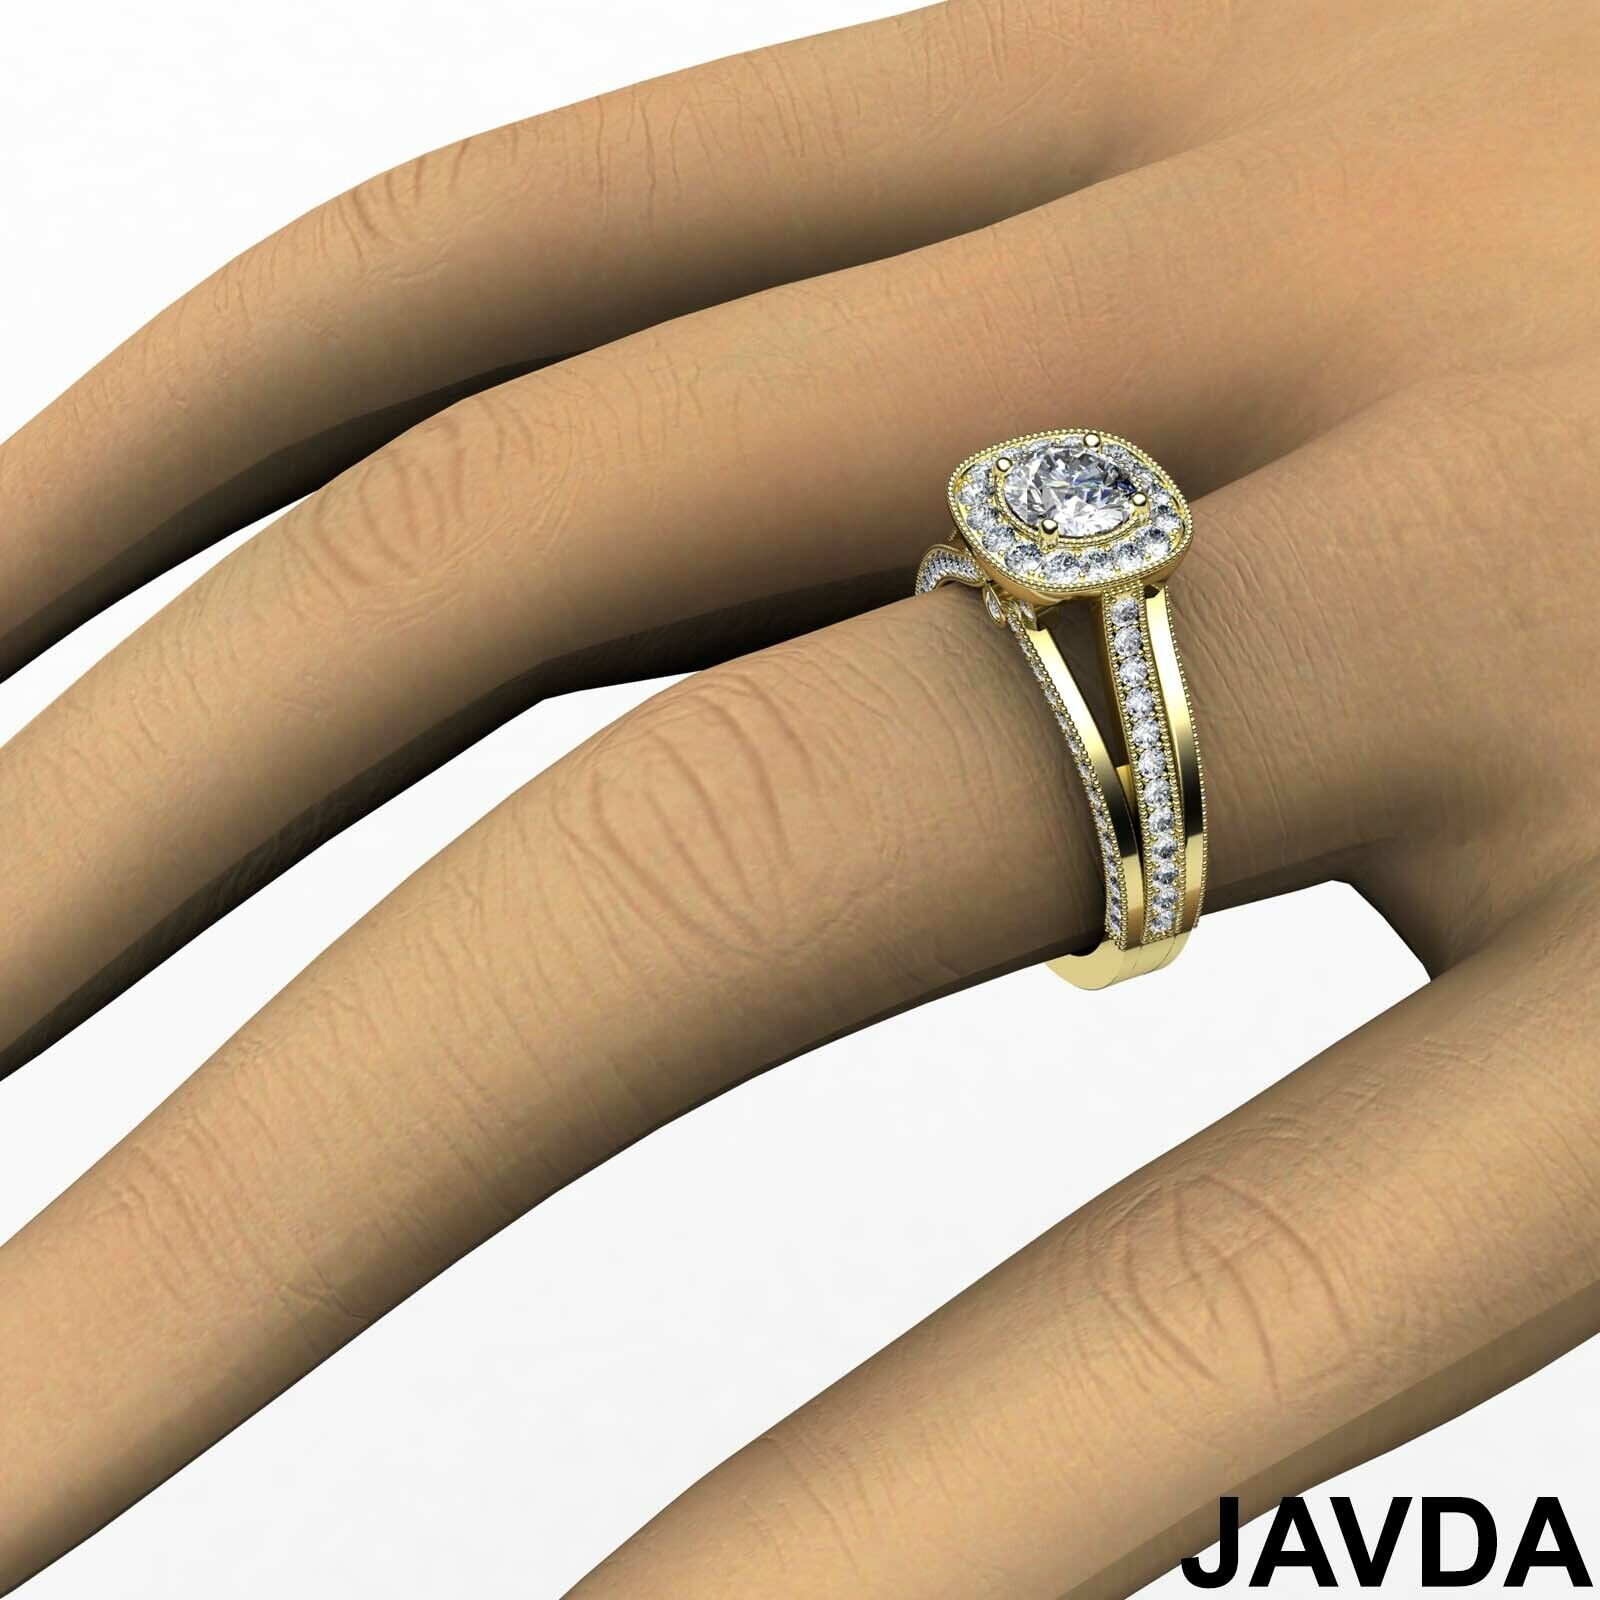 1.6ctw Bridge Accent Round Diamond Engagement Ring GIA E-VVS2 White Gold Rings 9